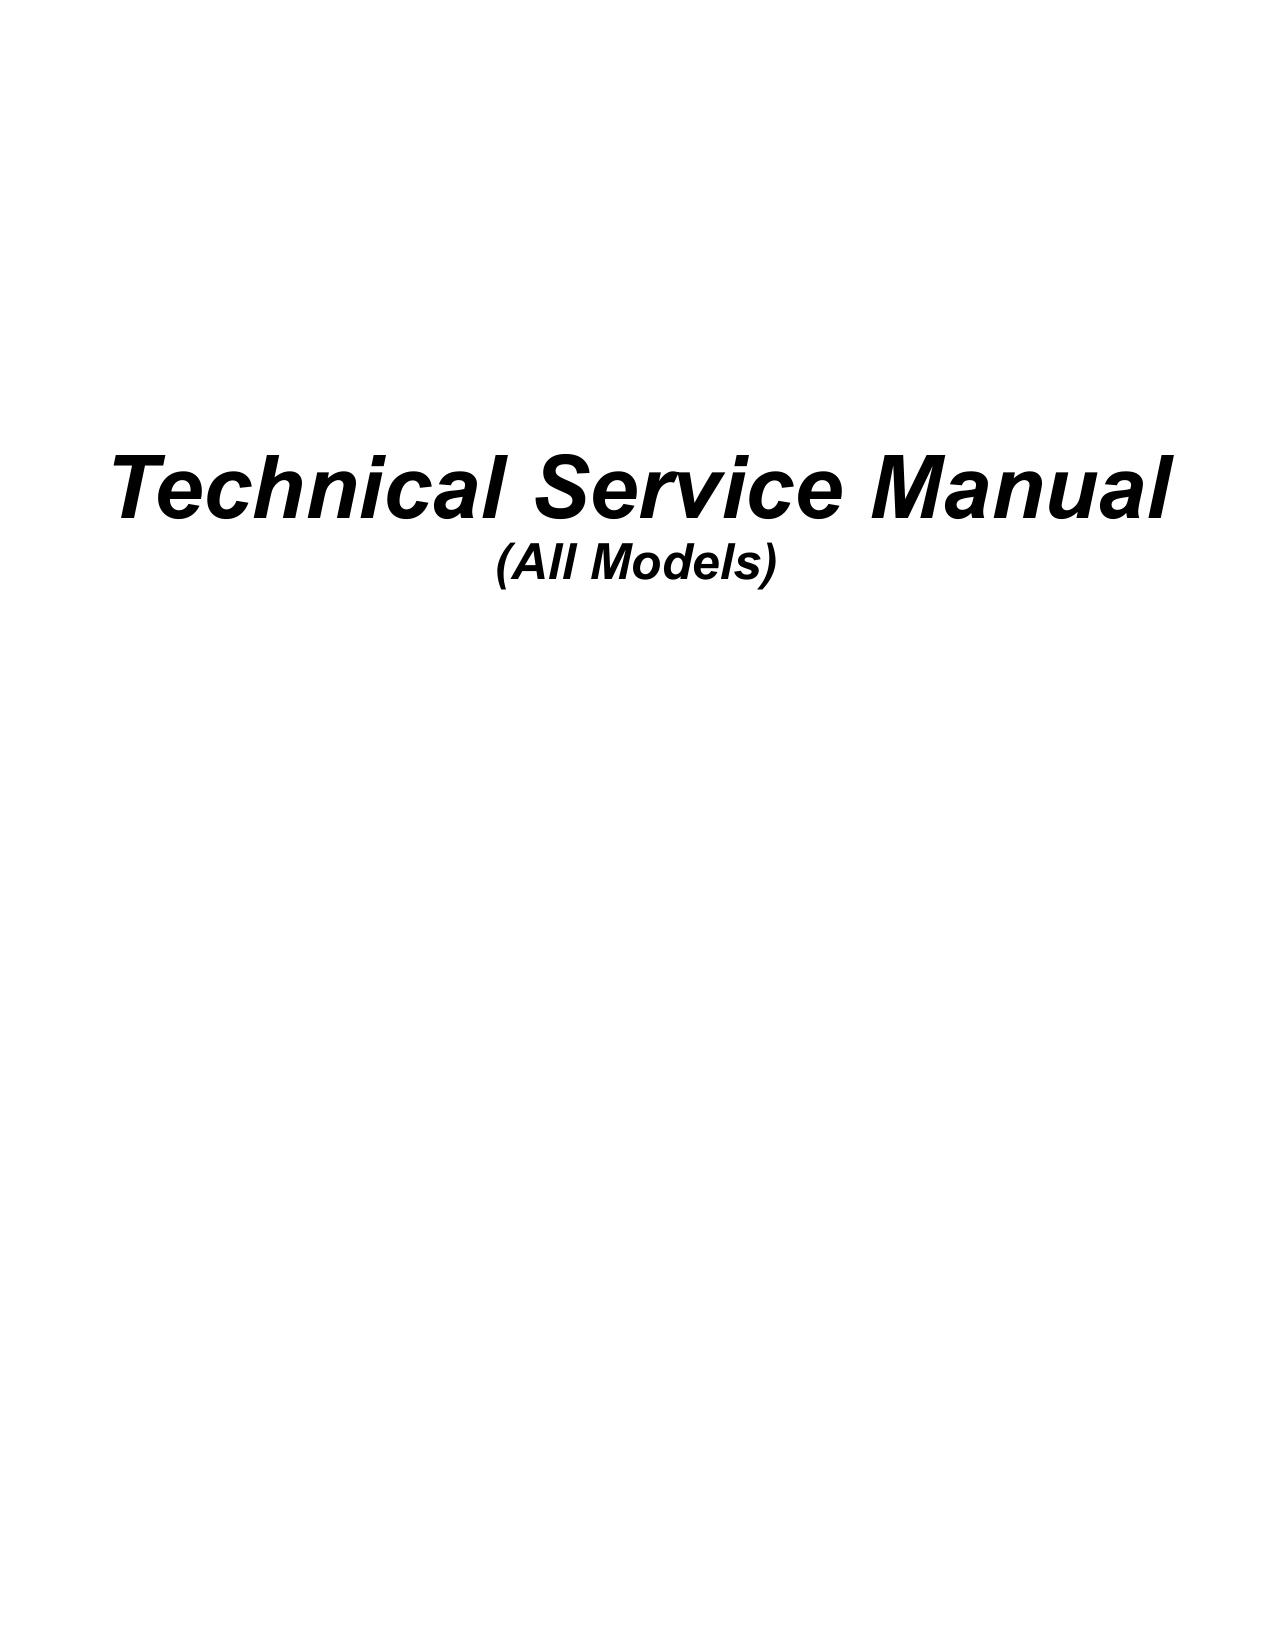 pdf for true t 49f zer manual pdf for true zer t 49f manual